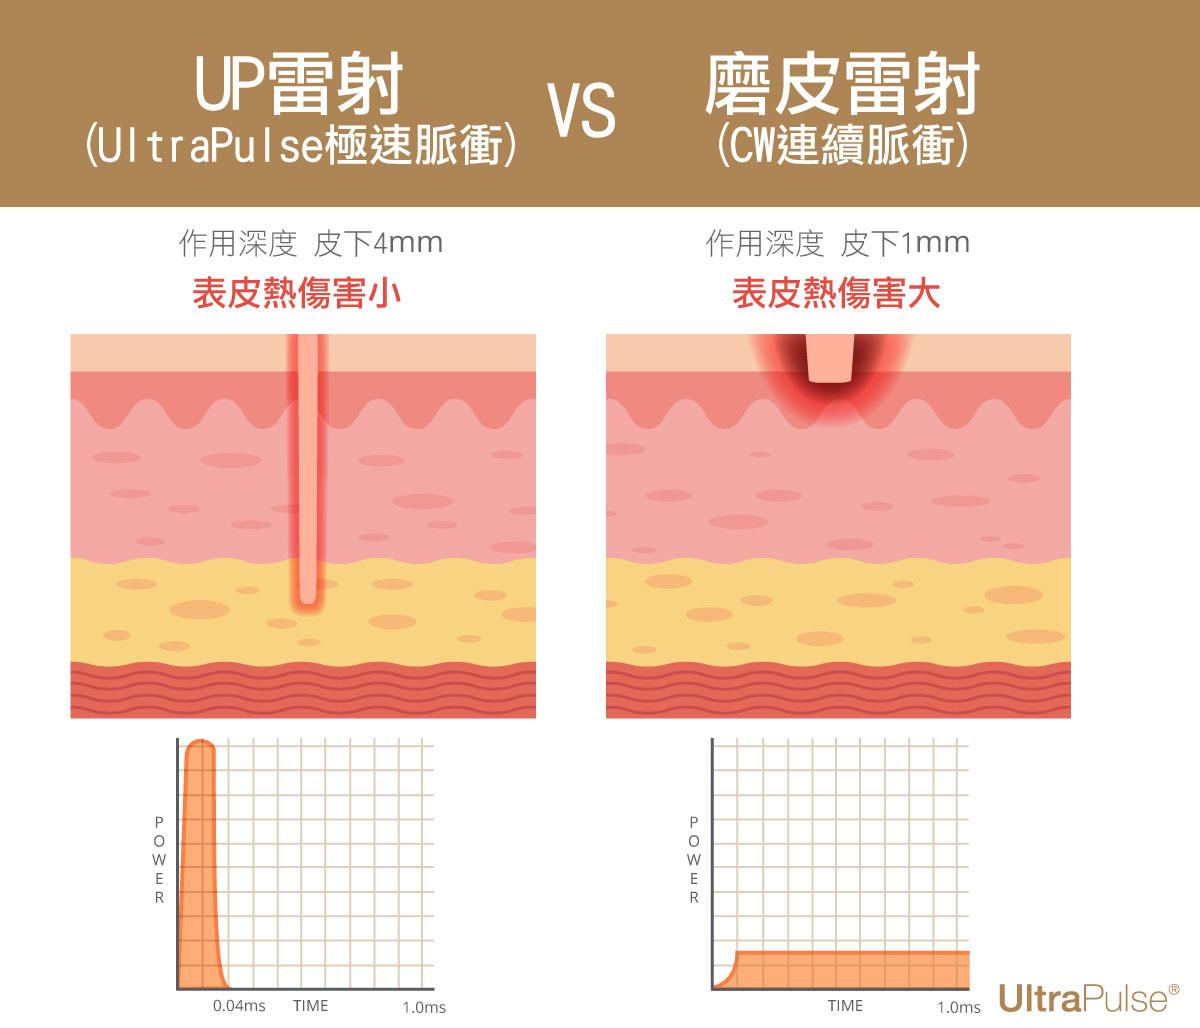 UP雷射CW雷射傳統二氧化碳雷射表皮傷害汽化雷射UltraPulse飛梭雷射